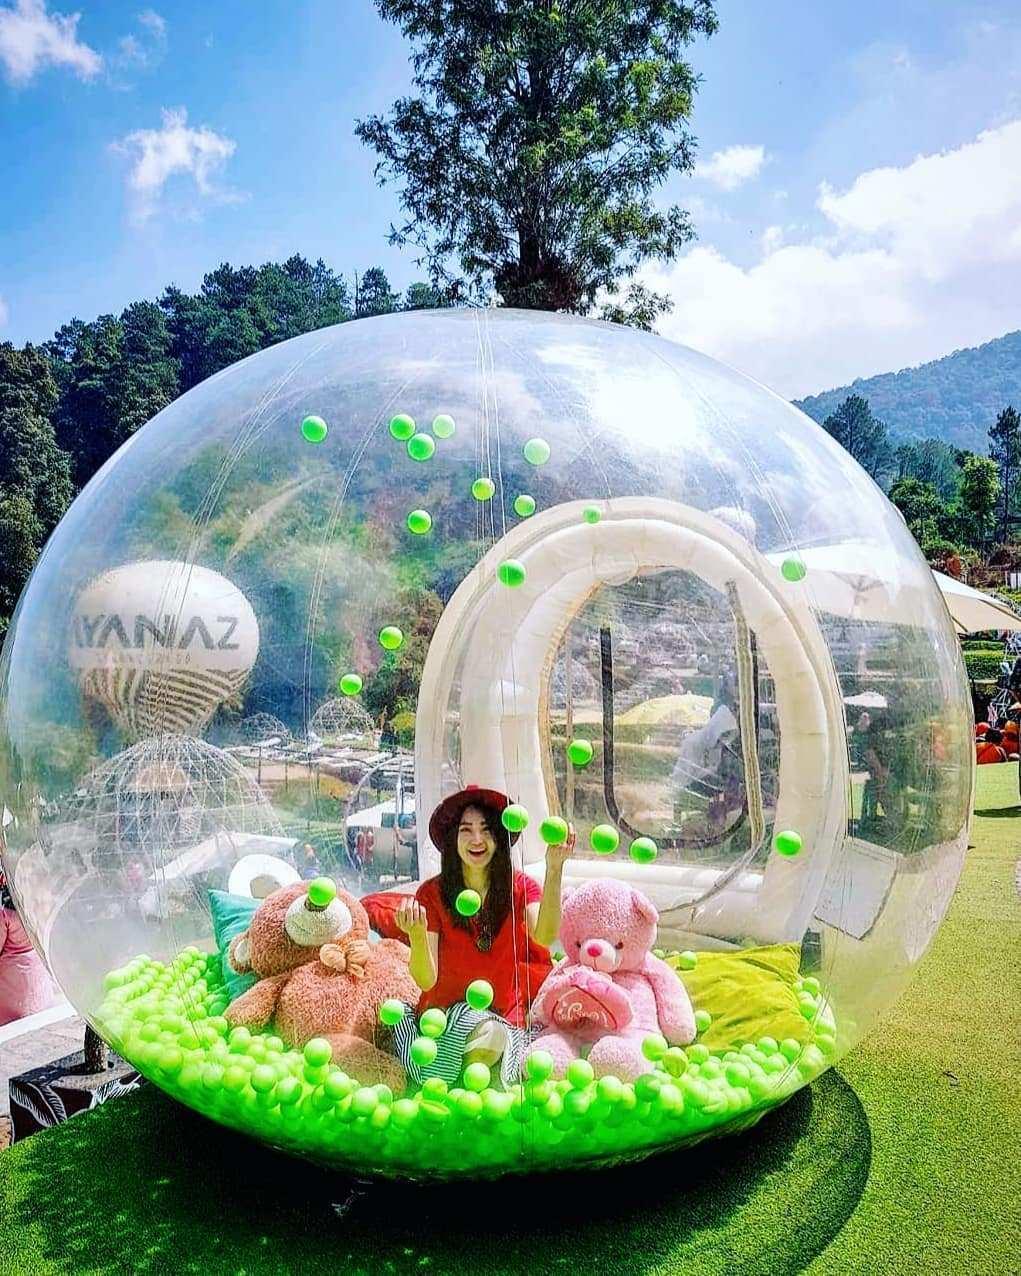 Bermain Bola di Dalam Buble Tent Yang ada di Ayanaz Gedongsongo Semarang Image From @jenhong_mom